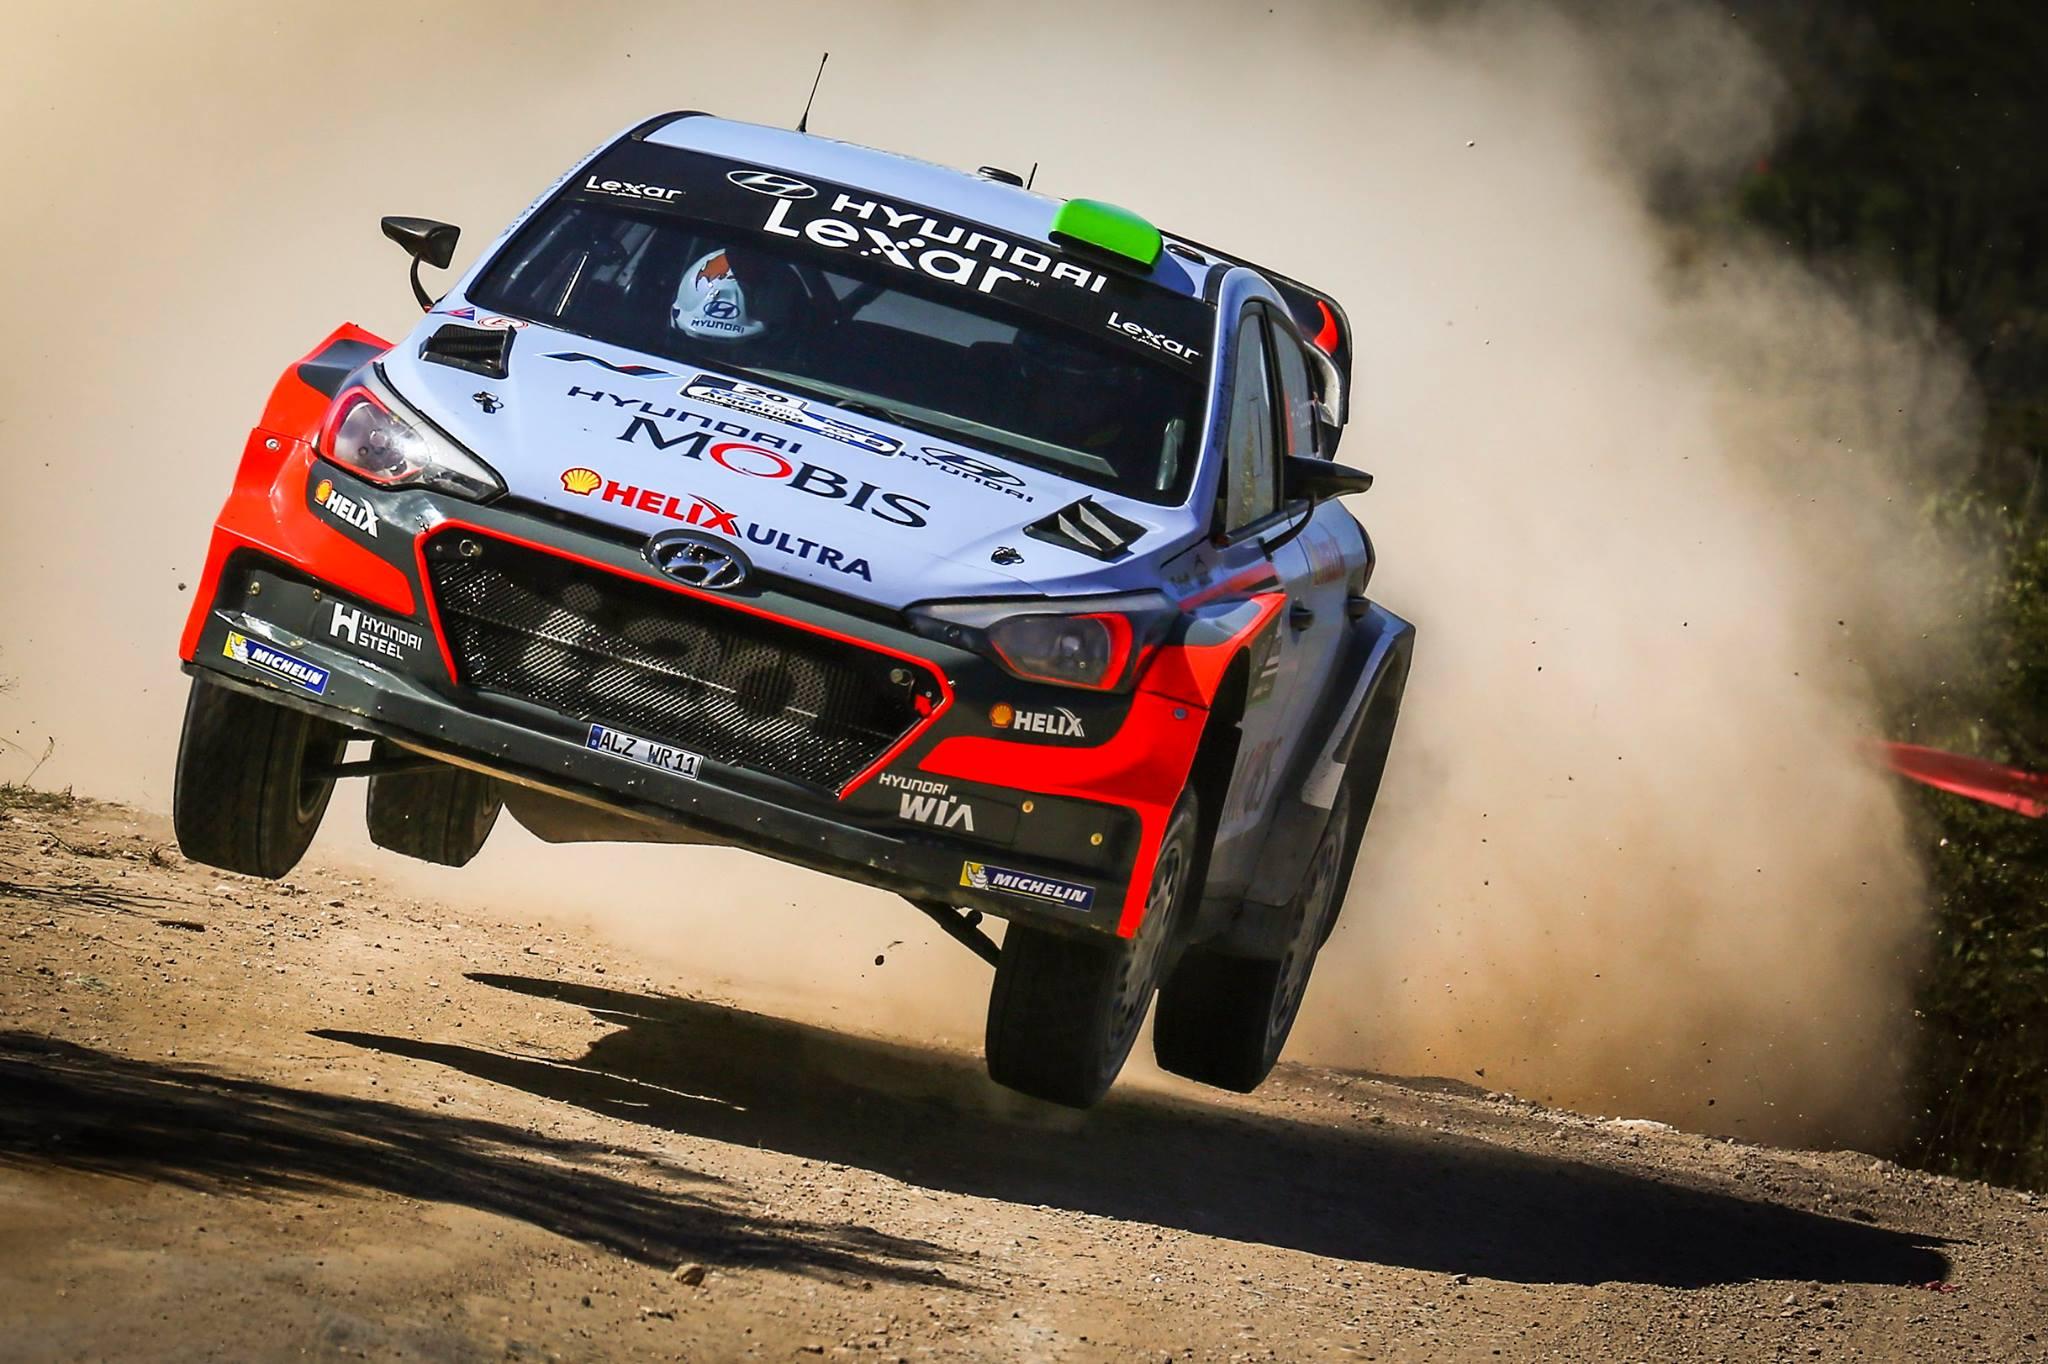 Znalezione obrazy dla zapytania Hyundai I20 WRC 2016 paddon